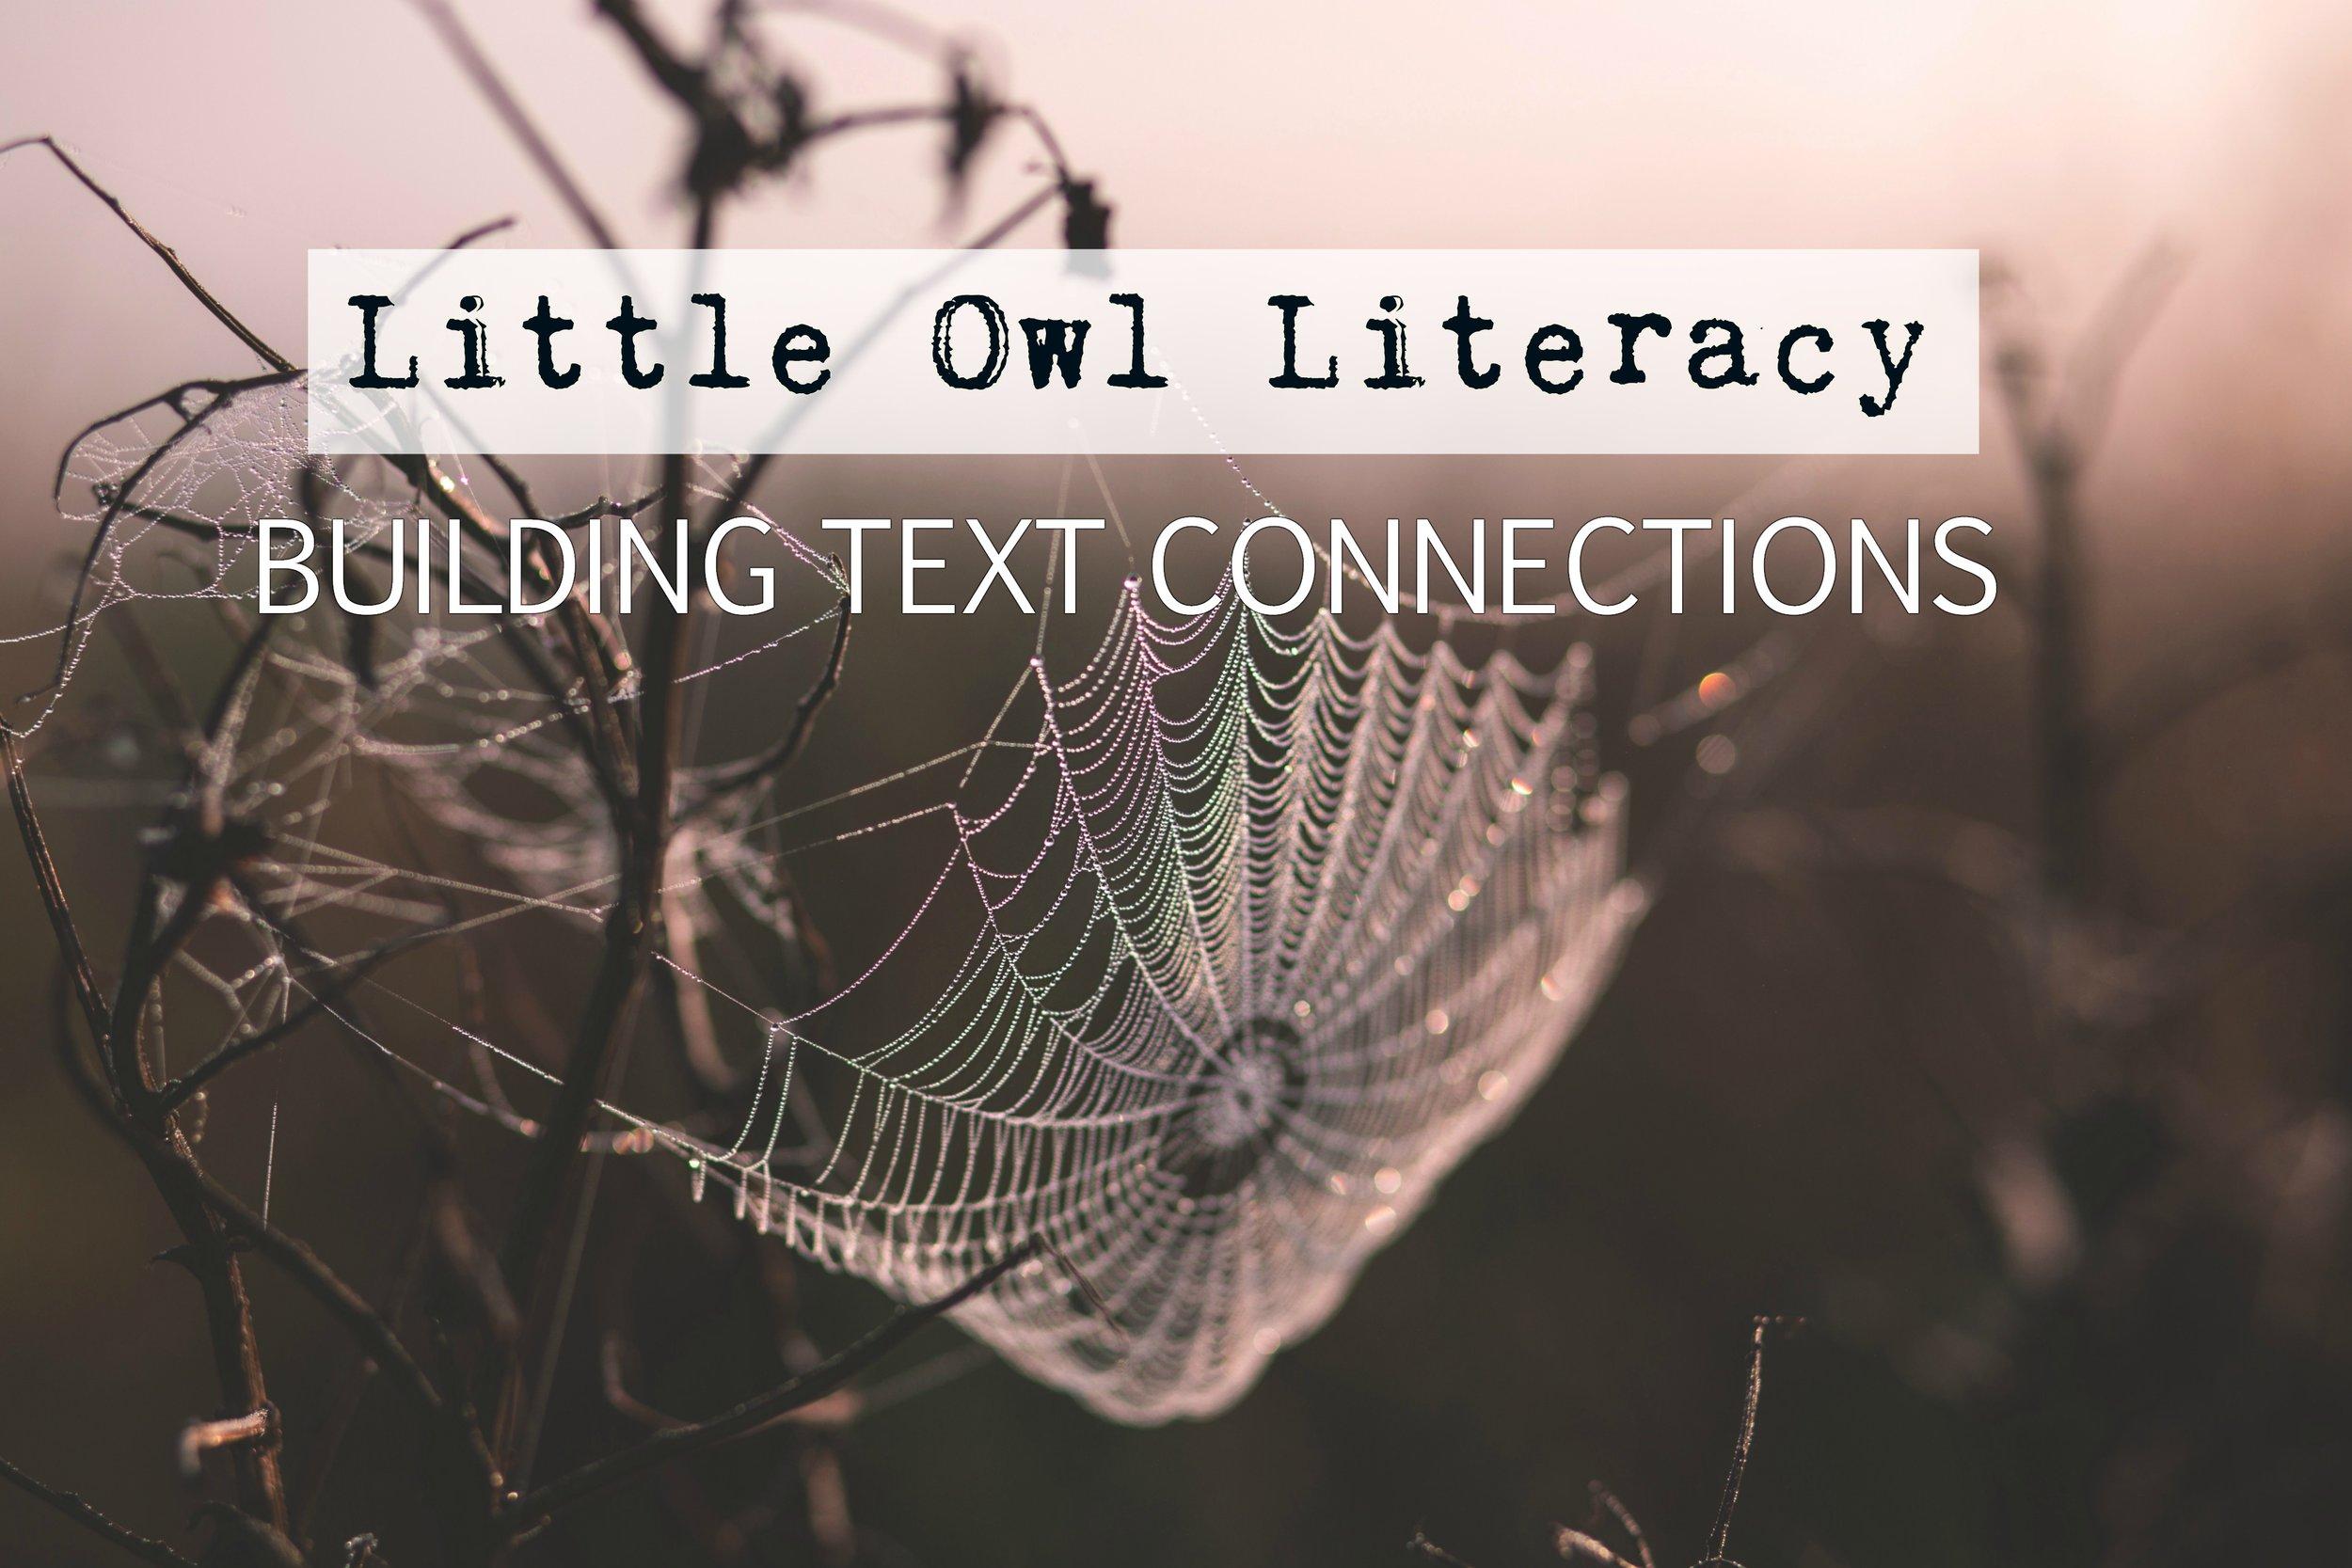 littleowl-textconnections.jpg